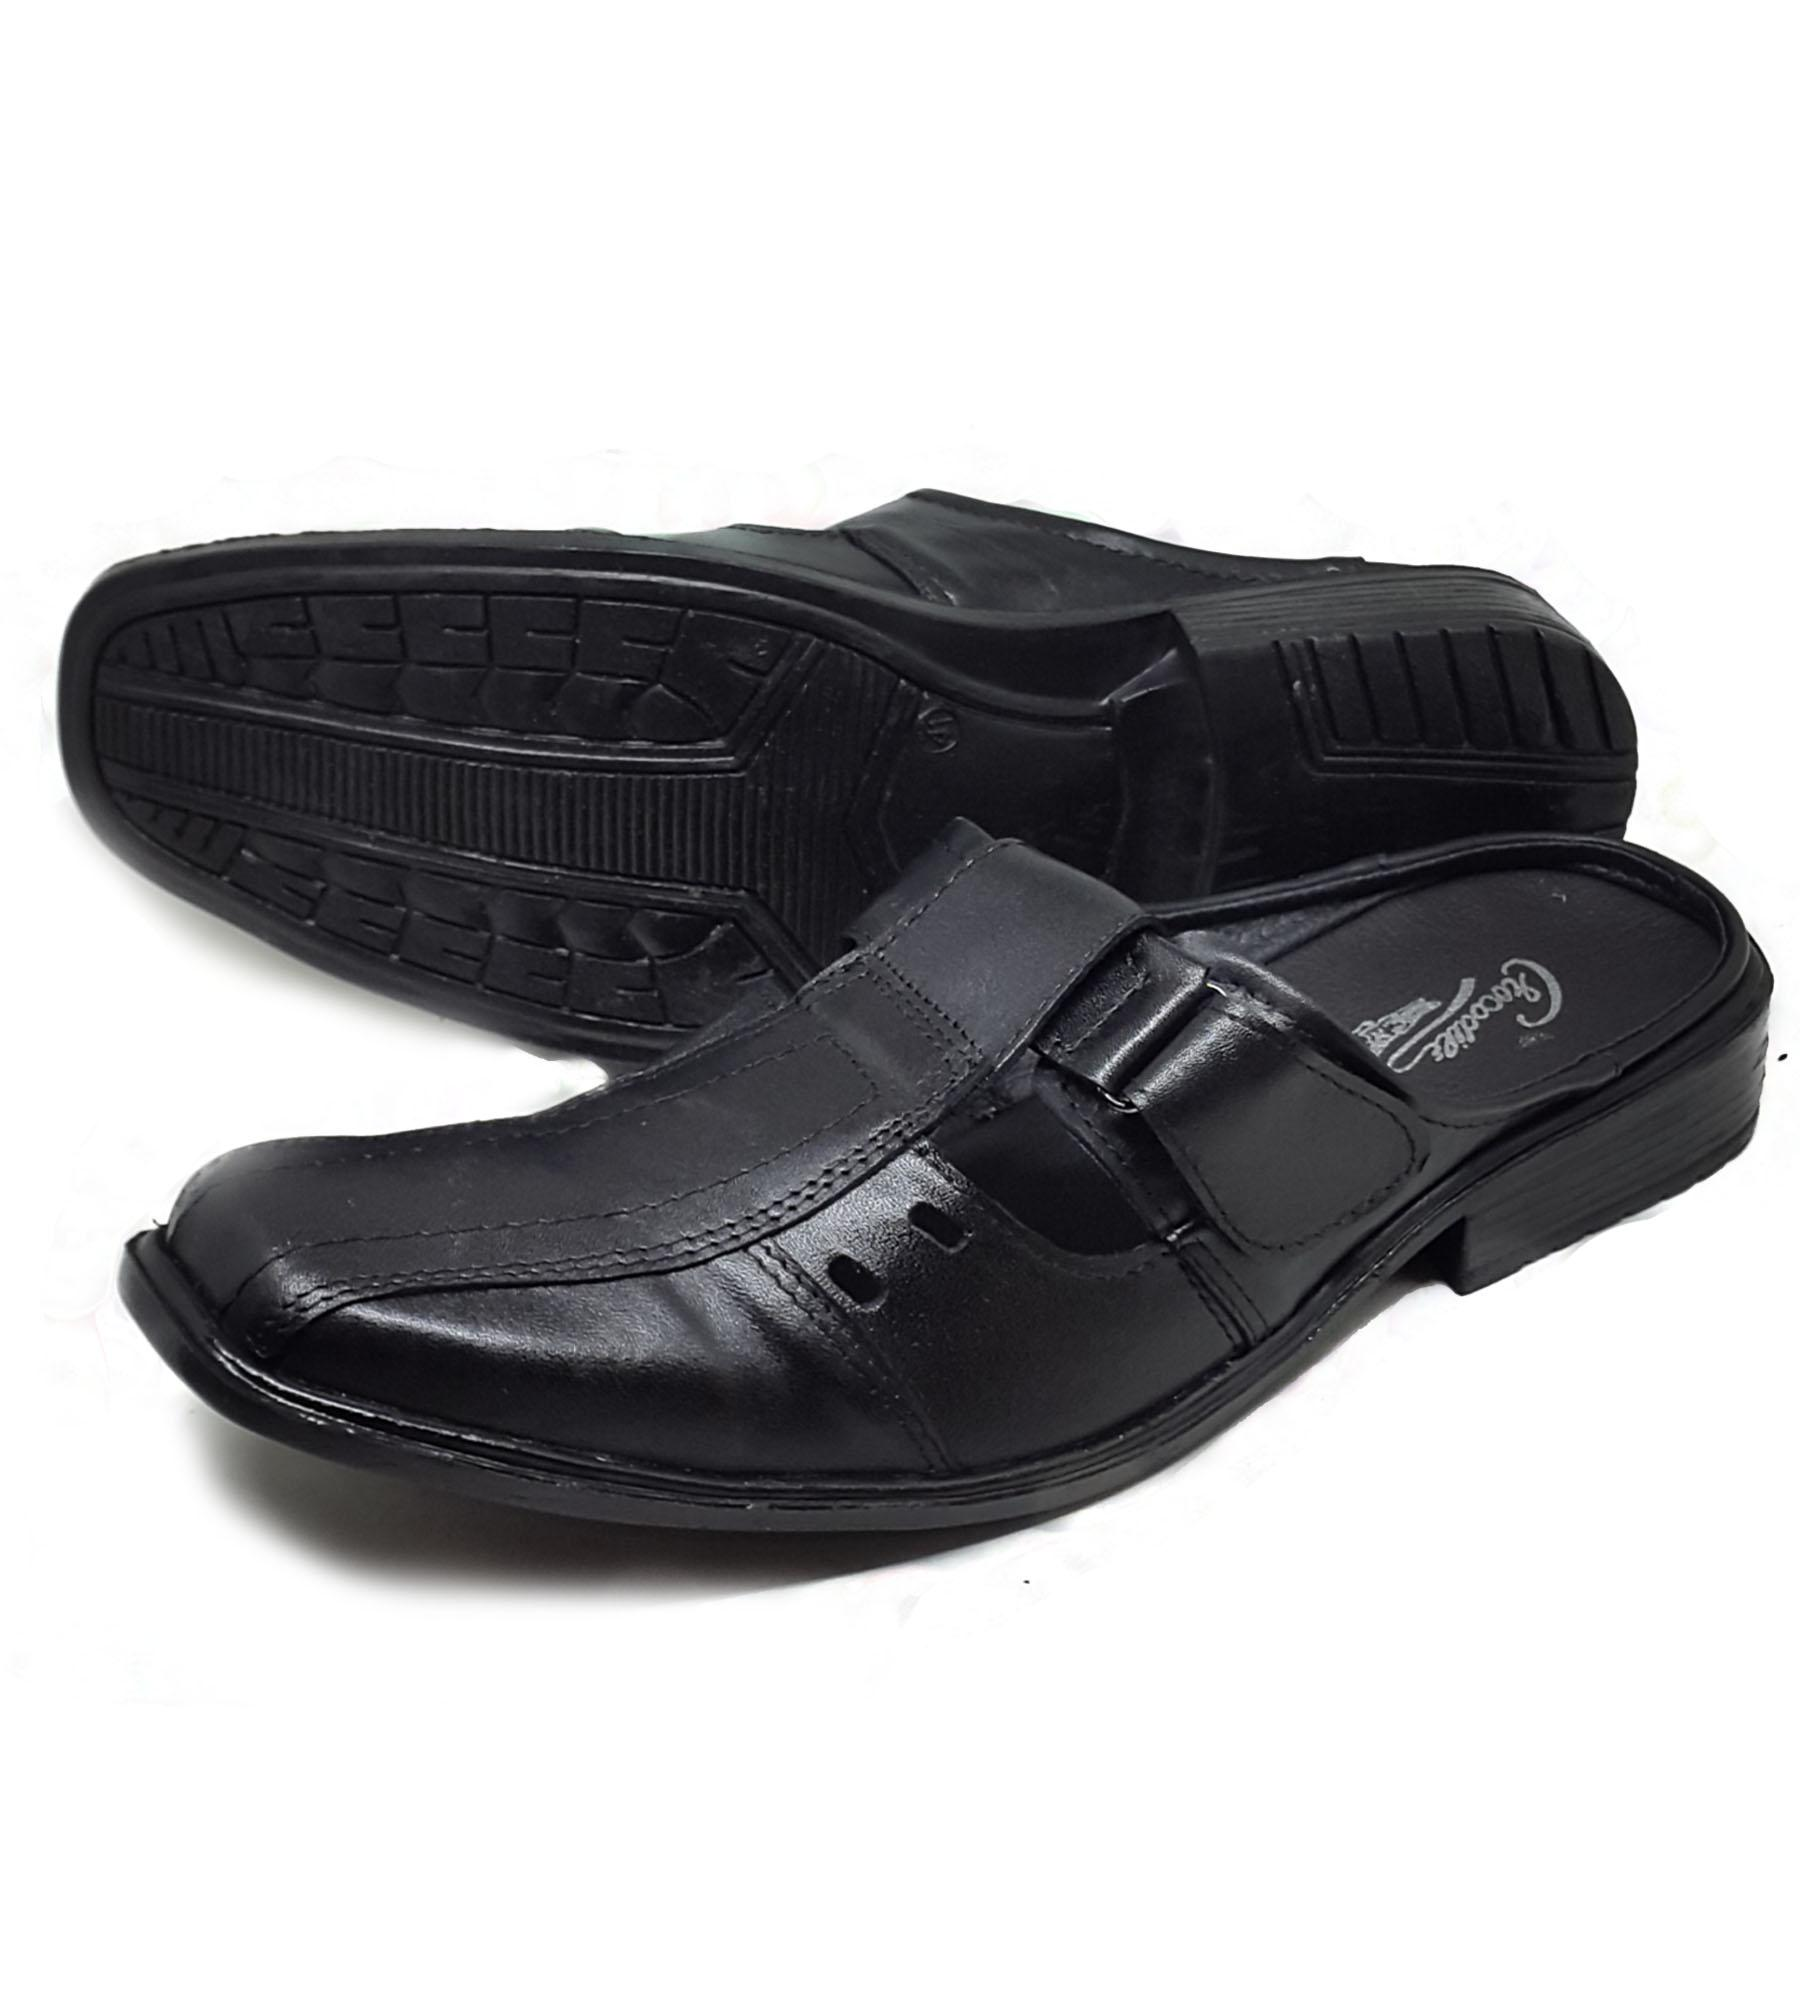 Sepatu Selop Kwl Sandal Selop Lancip Pria Kulit Asli- Black By Arjun Shop.